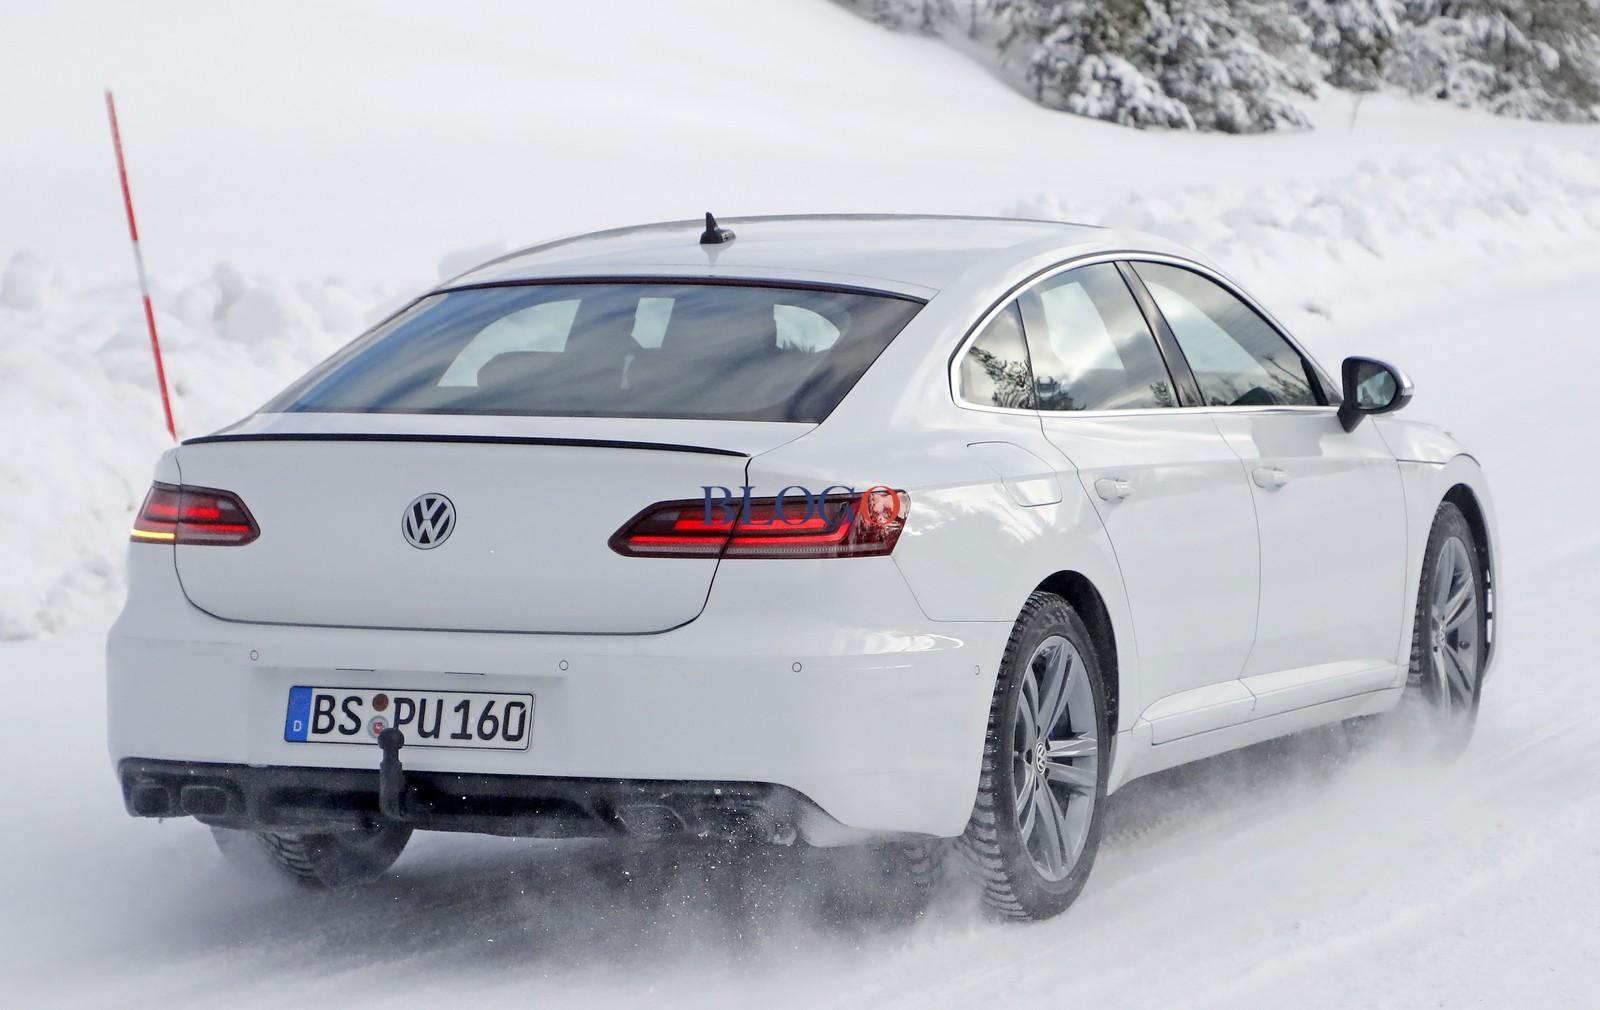 Volkswagen Arteon R - Poze Spion - Volkswagen Arteon R - Poze Spion